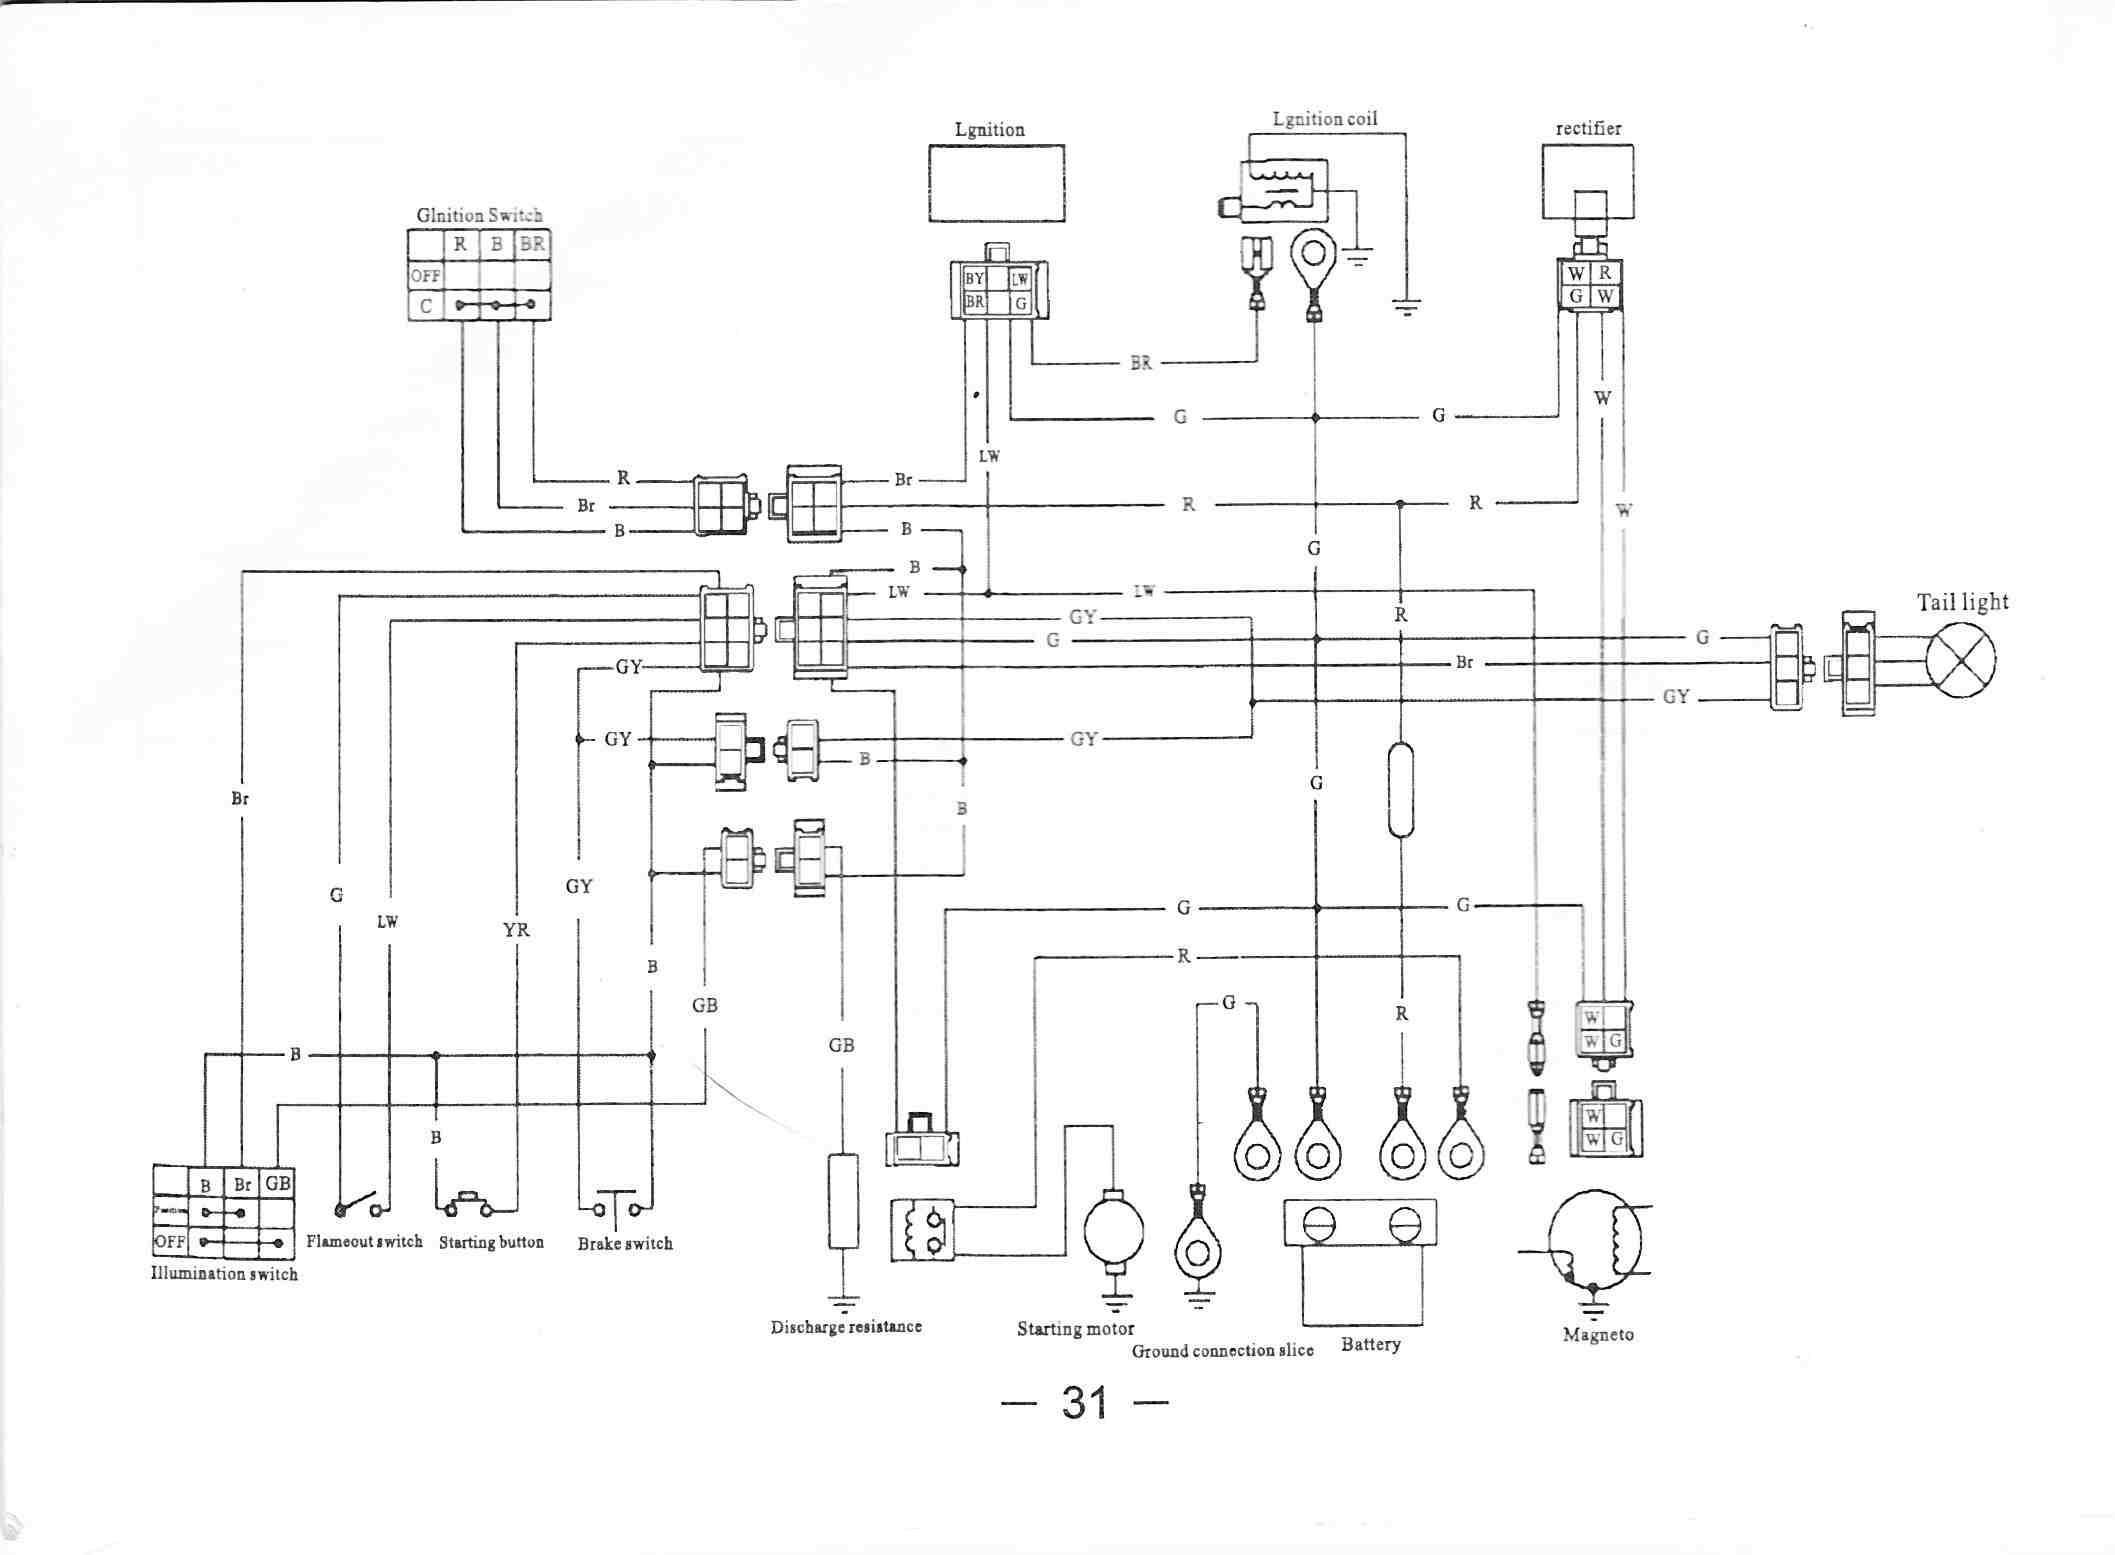 Atv Turn Signal Wiring Diagram 50cc Dirt Bike Wiring Diagram 50cc Circuit Diagrams Wiring Info • Of Atv Turn Signal Wiring Diagram